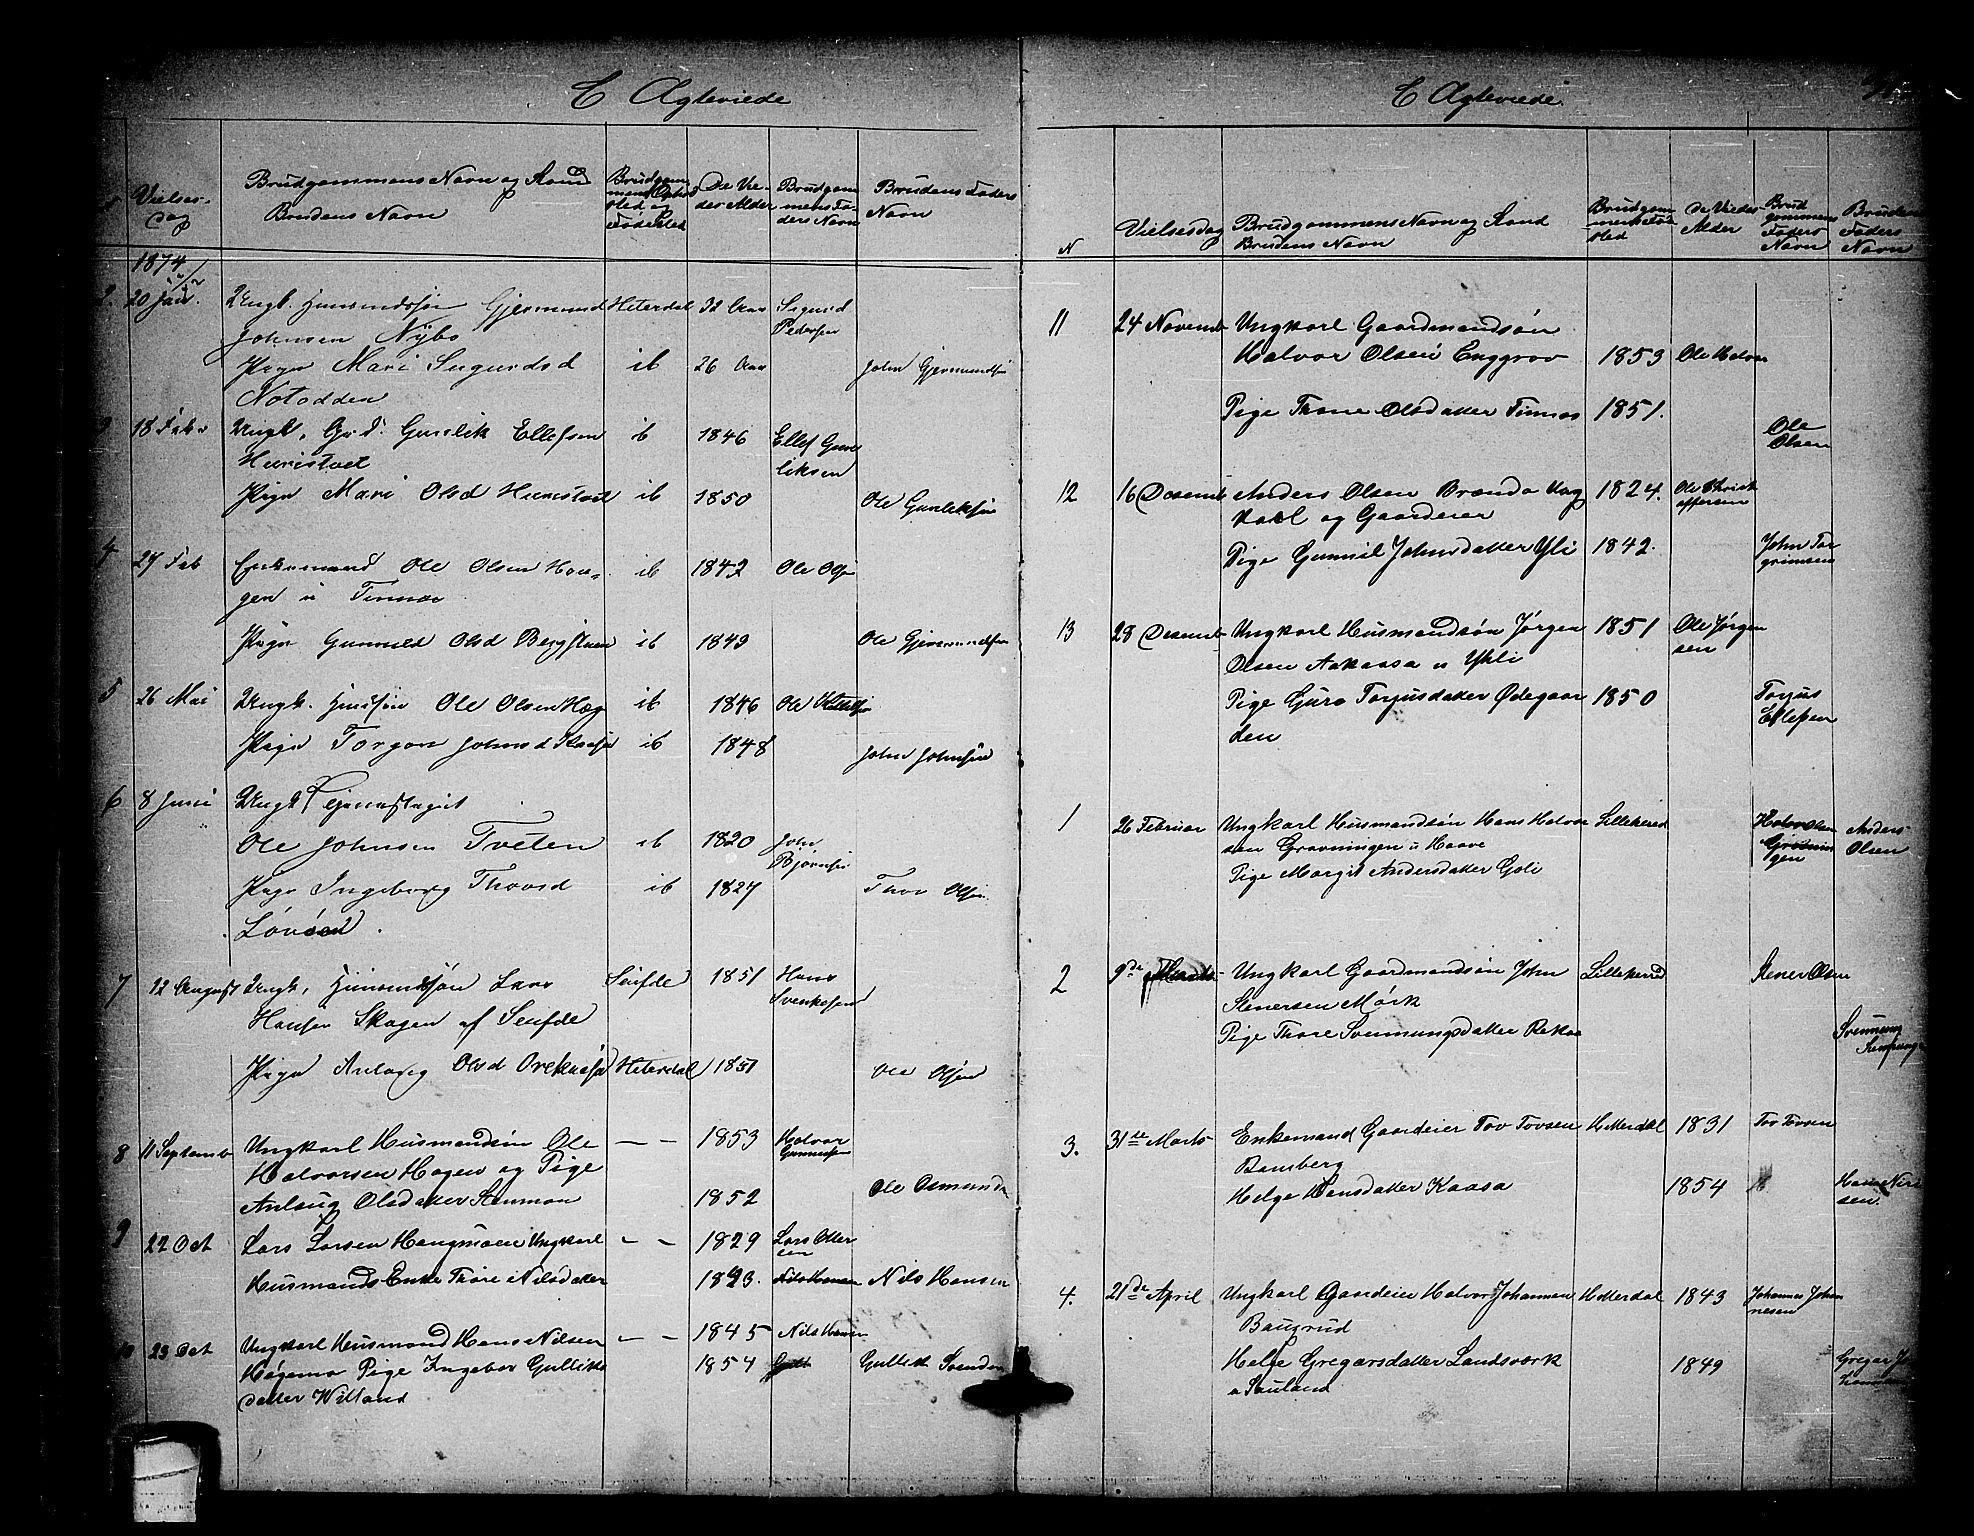 SAKO, Heddal kirkebøker, G/Ga/L0001: Klokkerbok nr. I 1, 1866-1878, s. 312-313